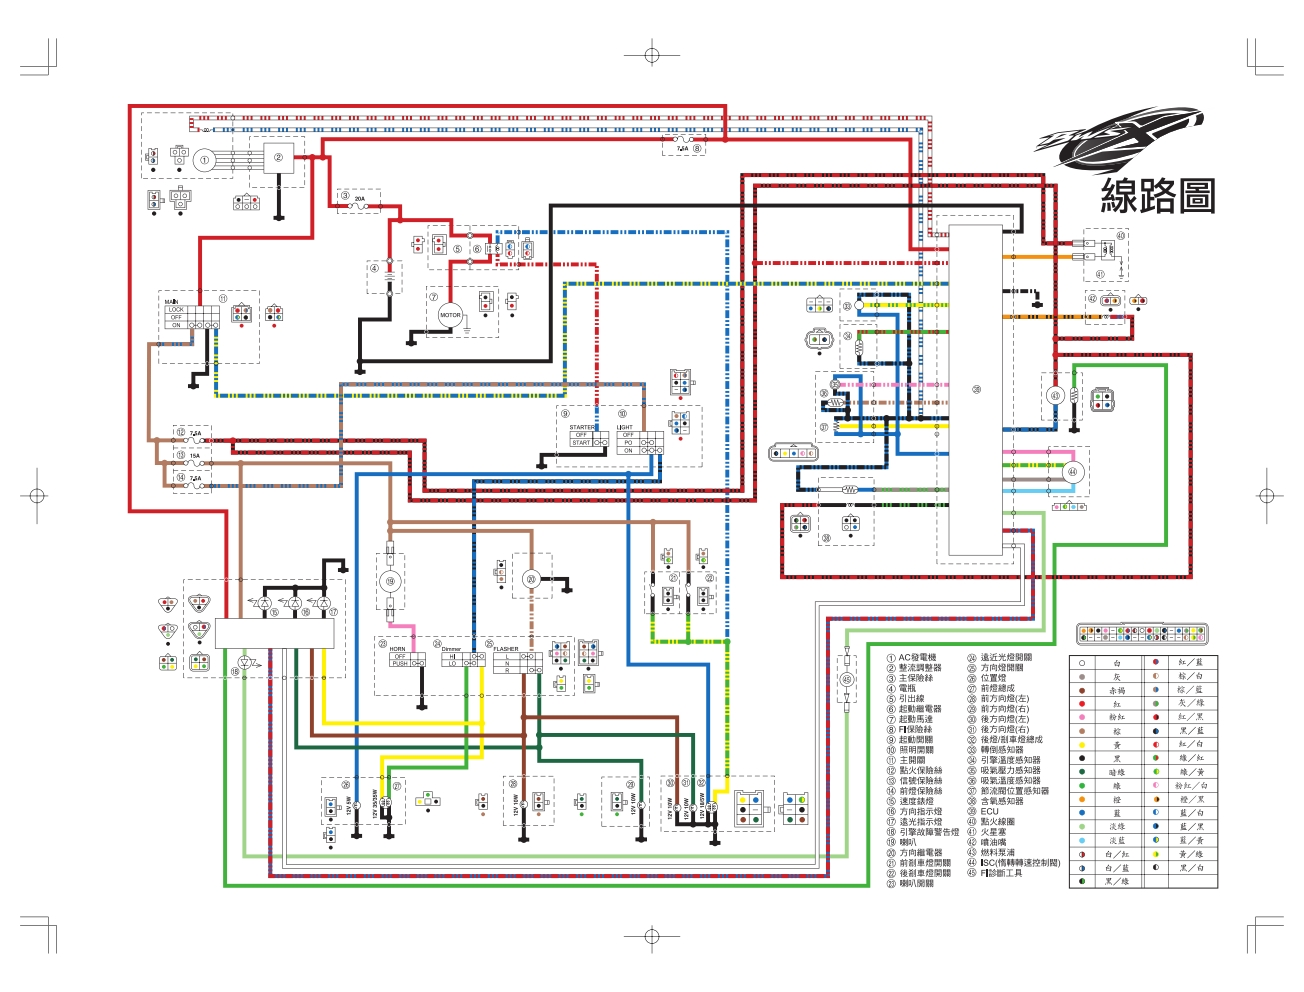 2003 Yamaha Zuma Wiring Diagram - Wiring Diagram Replace tame-progressive -  tame-progressive.miramontiseo.it   2003 Yamaha Zuma Wiring Diagram      tame-progressive.miramontiseo.it